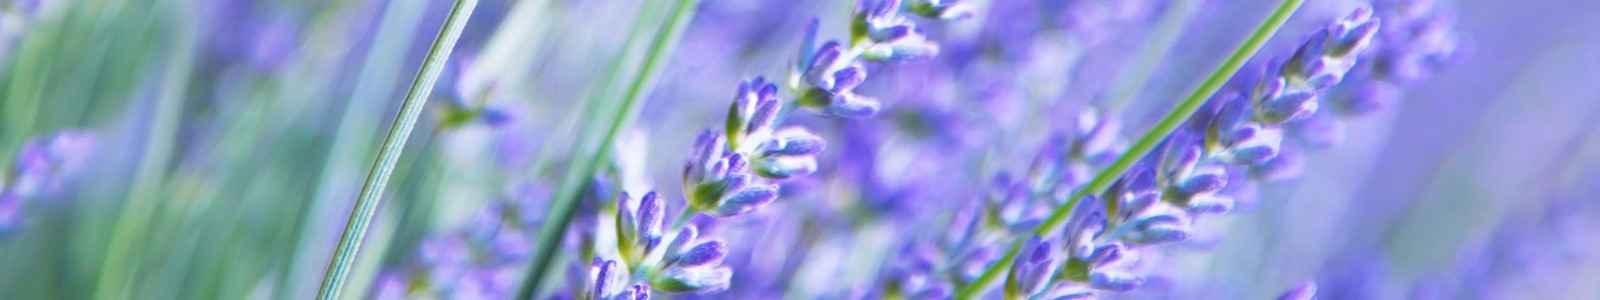 2231-lavendel-blomst-lilla-blaa-1600x300